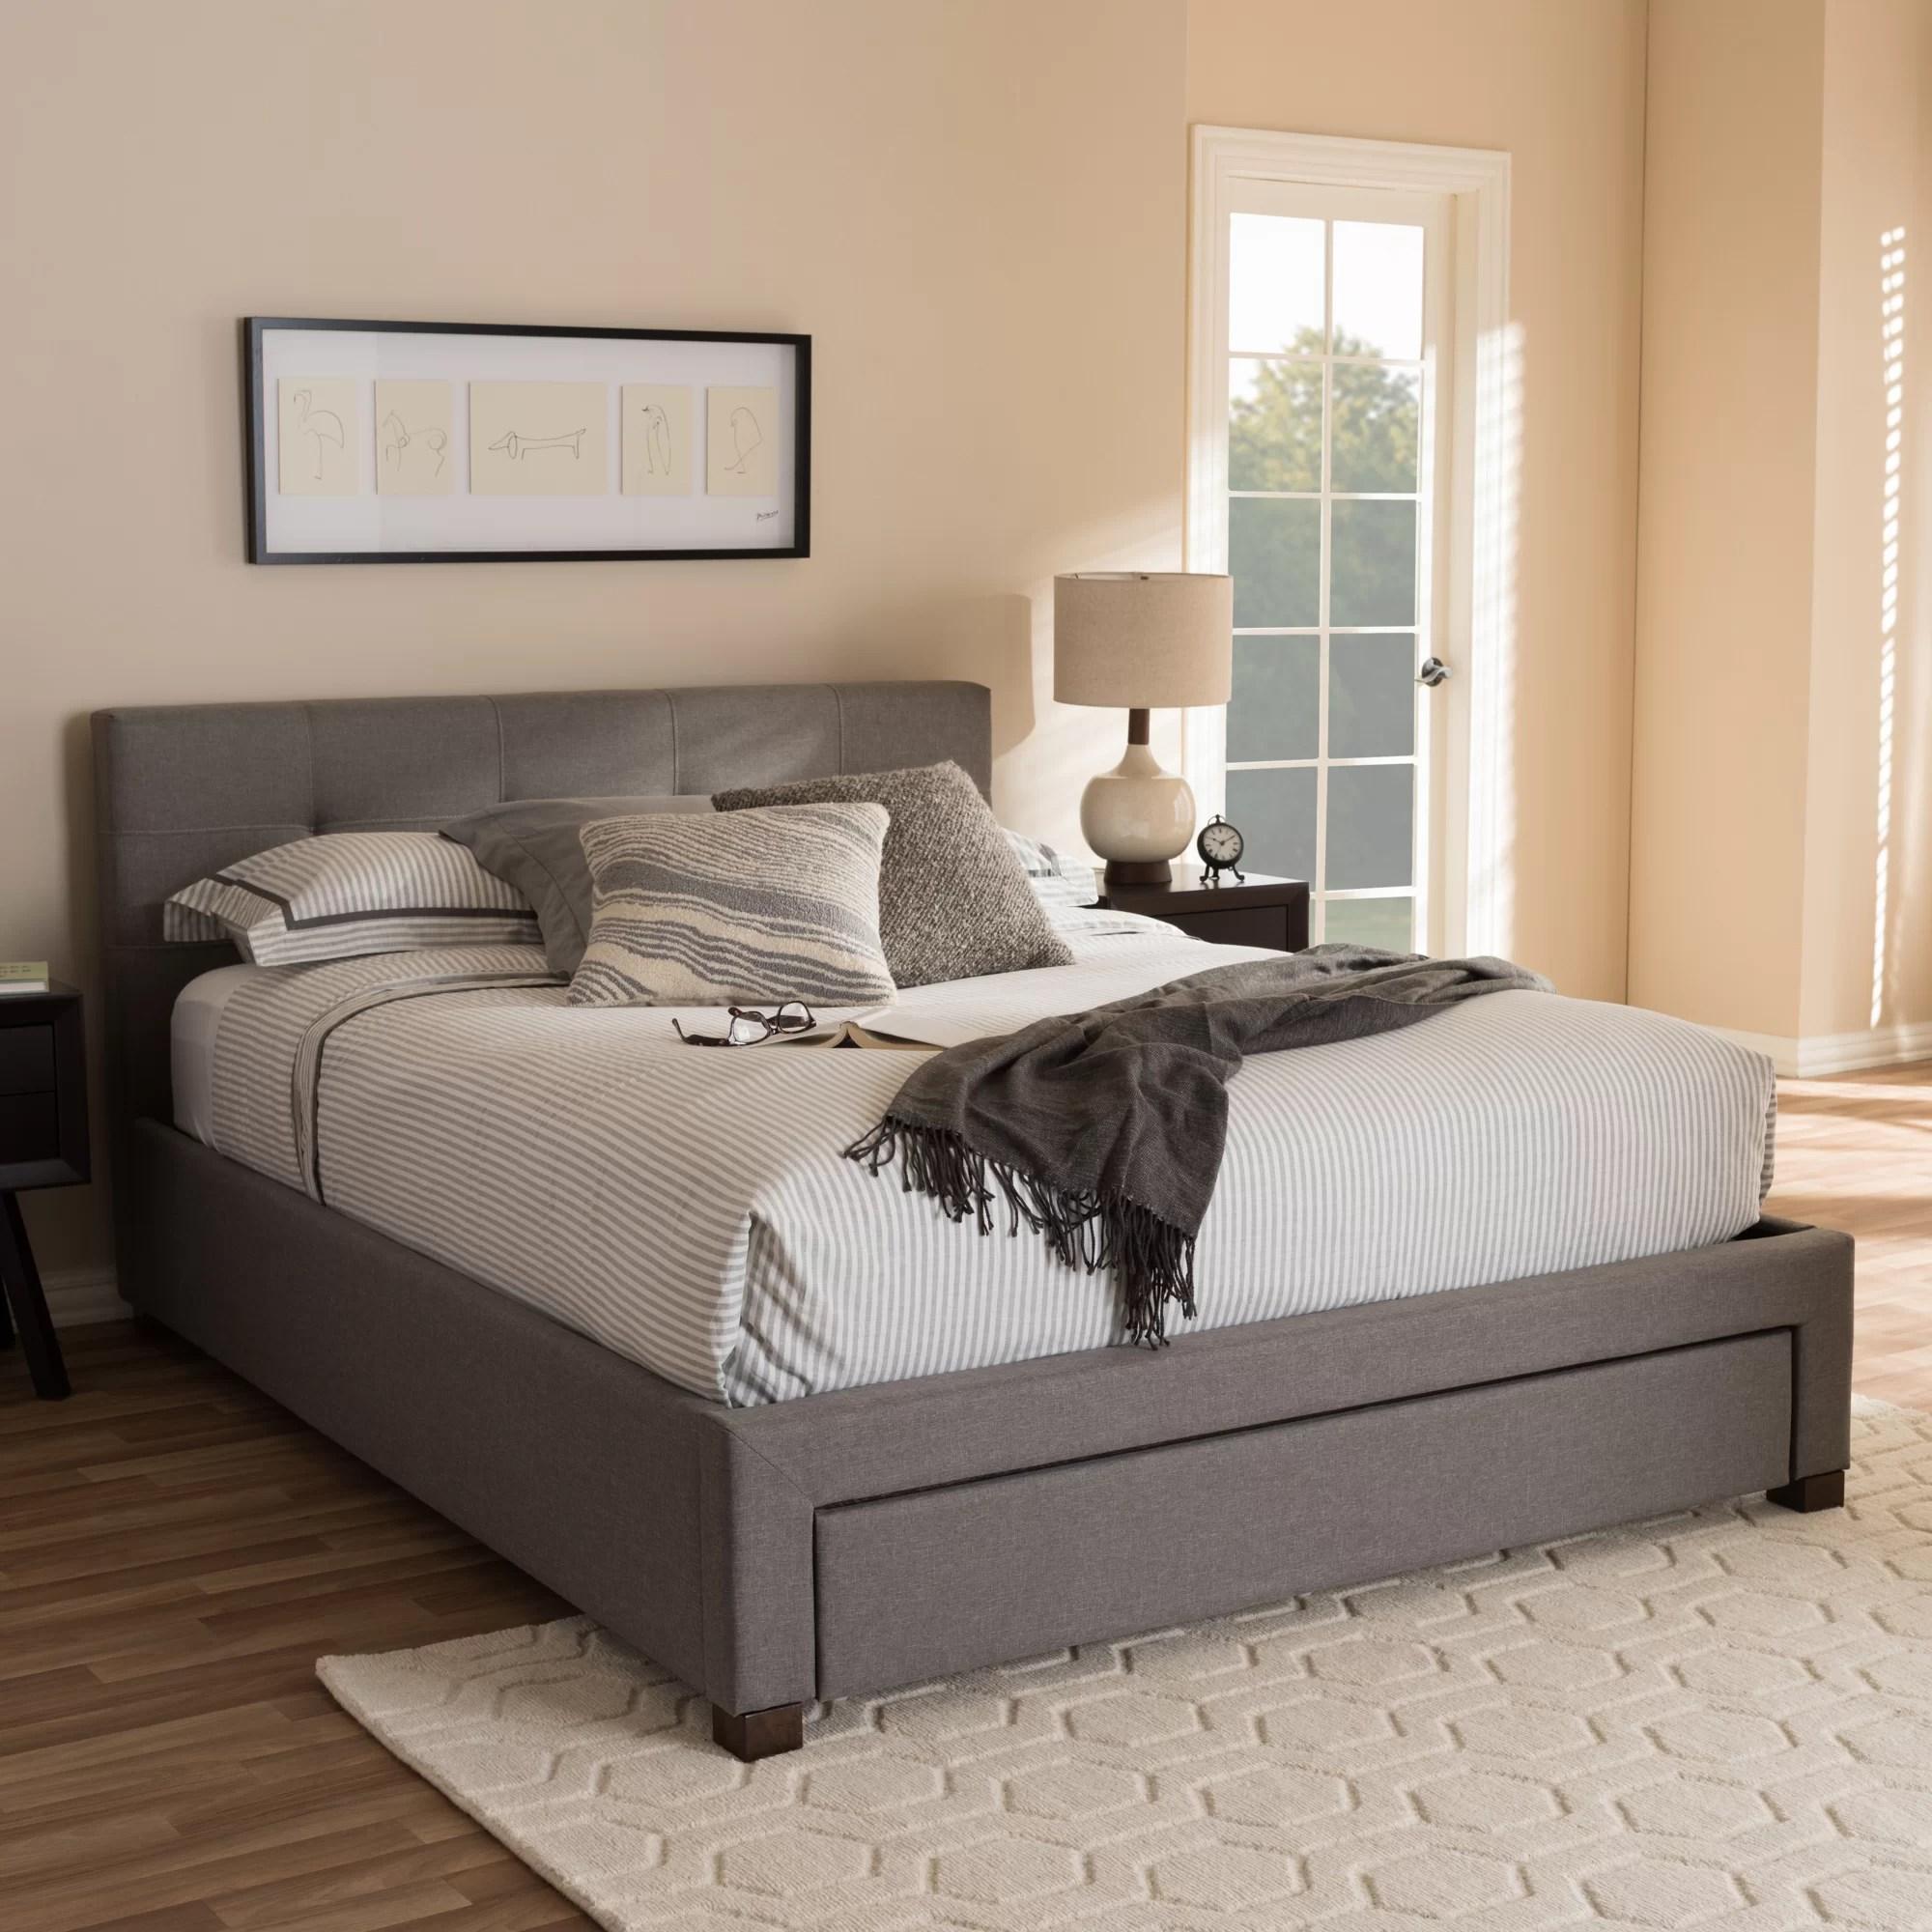 wayfair sofas reviews slumberland york sofa wholesale interiors baxton studio upholstered storage ...